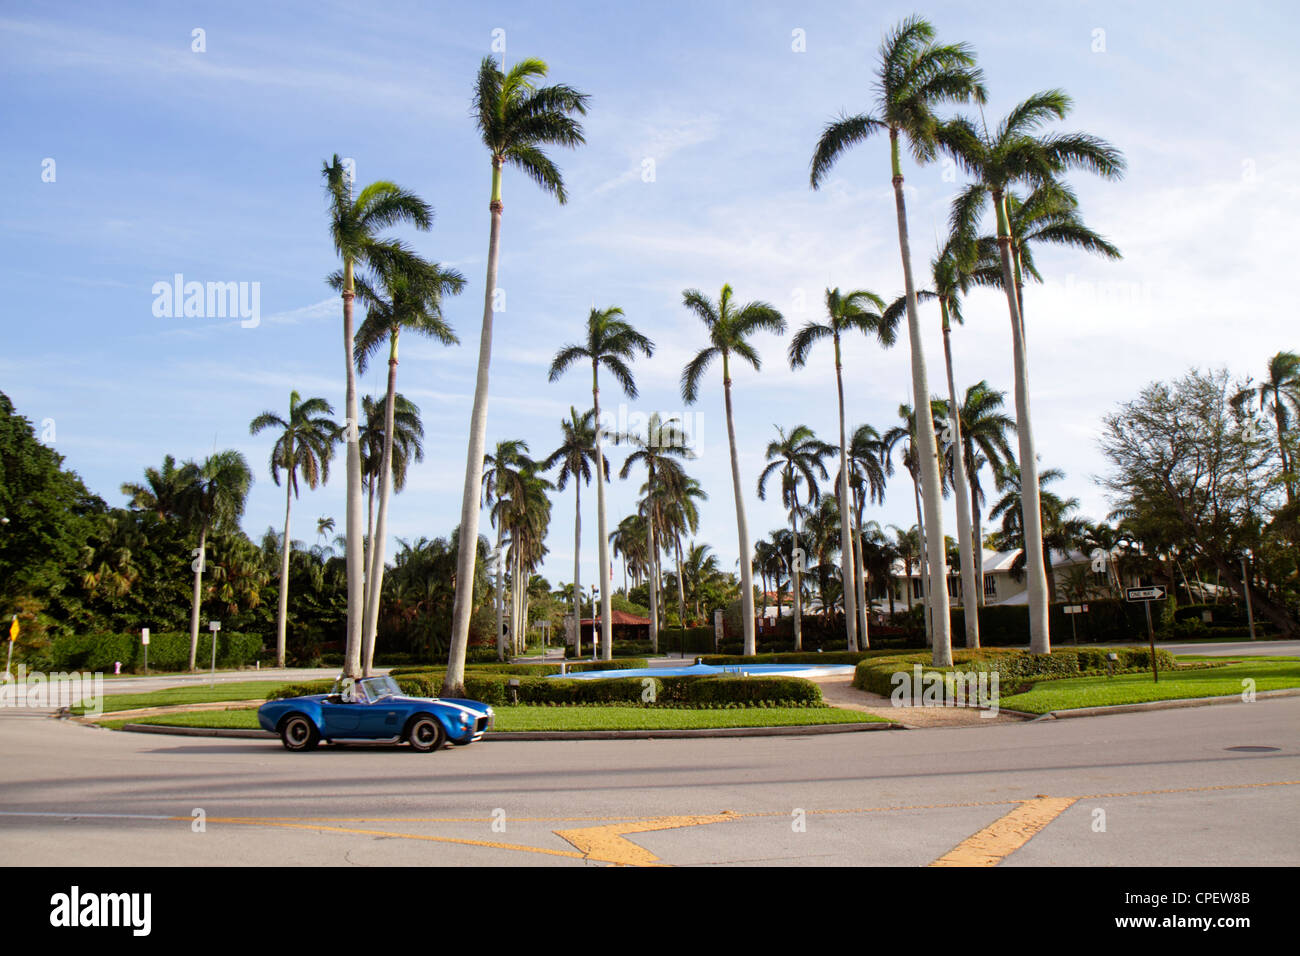 Boca Raton Florida East Camino Real Kreisverkehr Palmen blau Sportwagen Stockbild